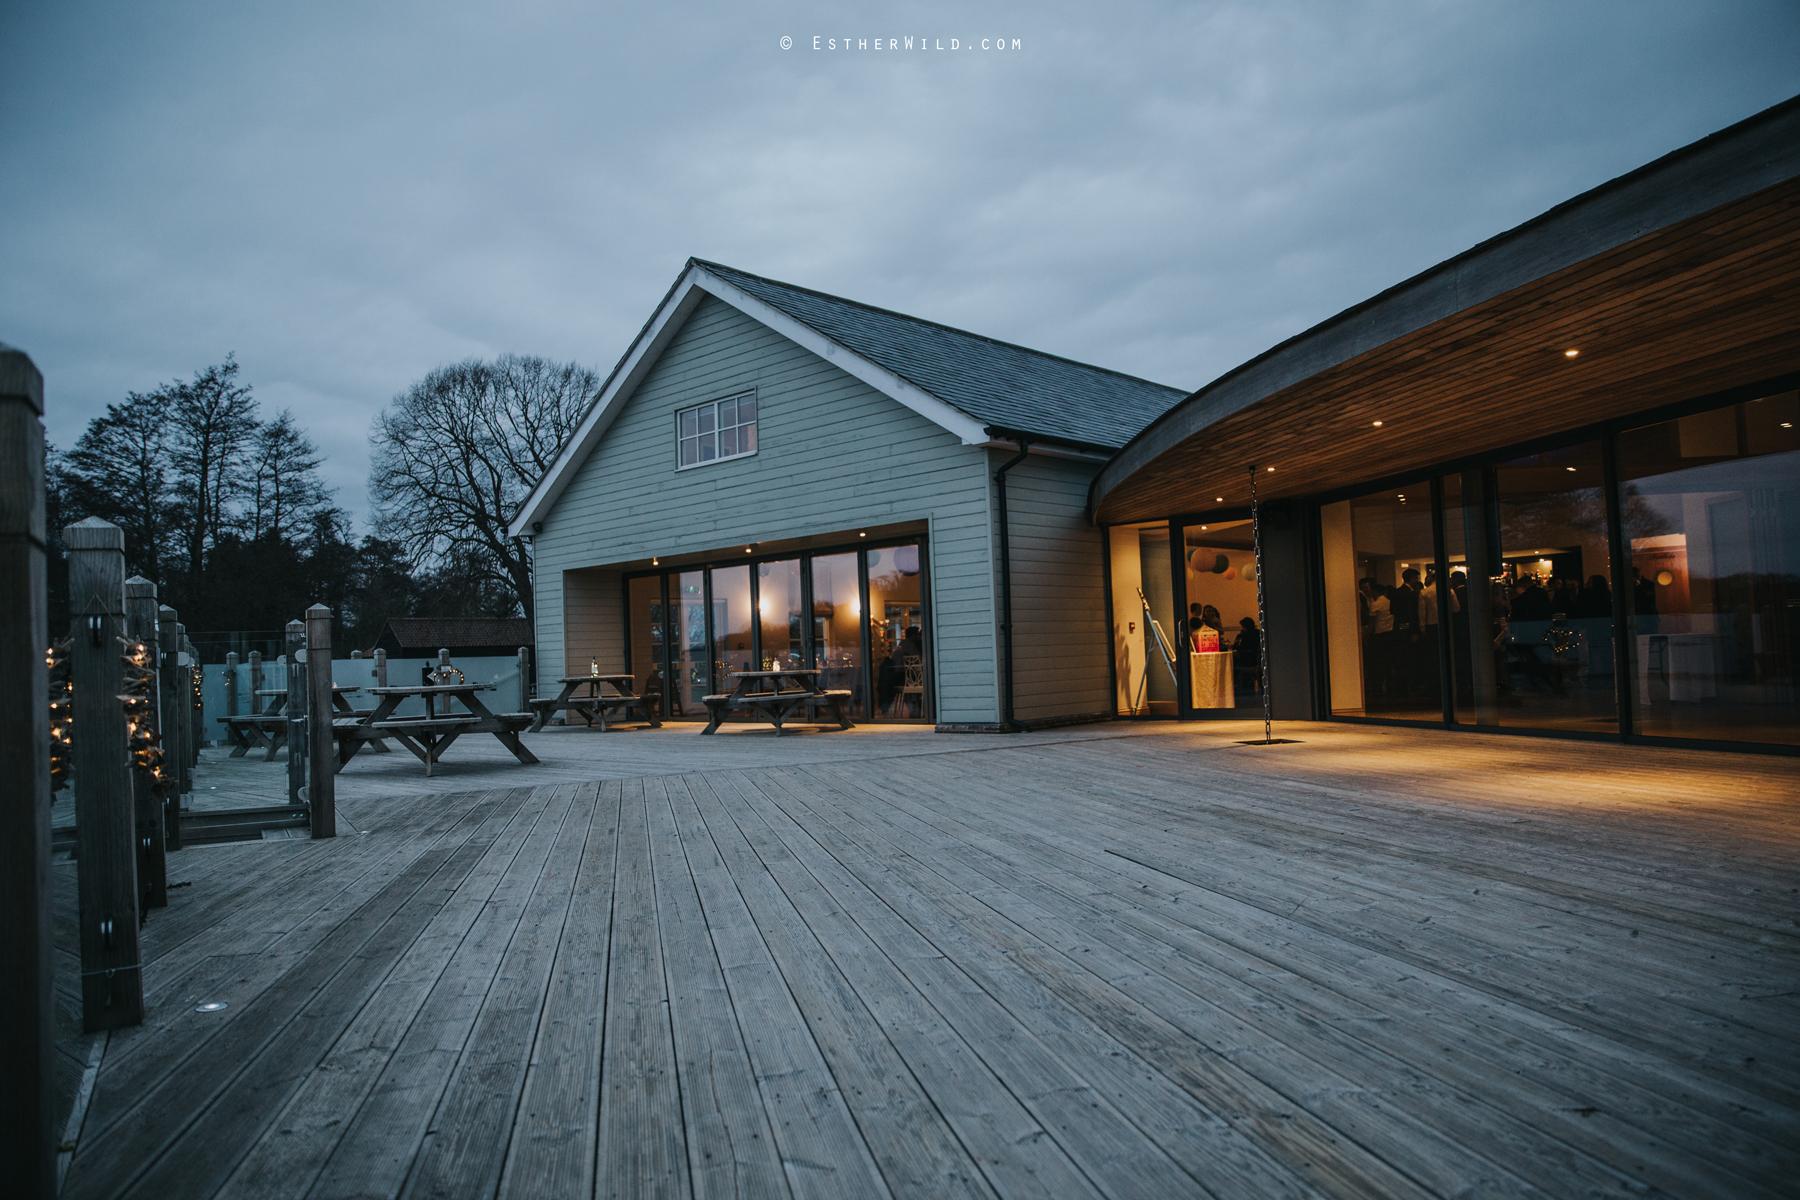 The_BoatHouse_Wedding_Venue_Ormesby_Norfolk_Broads_Boat_Wedding_Photography_Esther_Wild_Photographer_IMG_3355.jpg